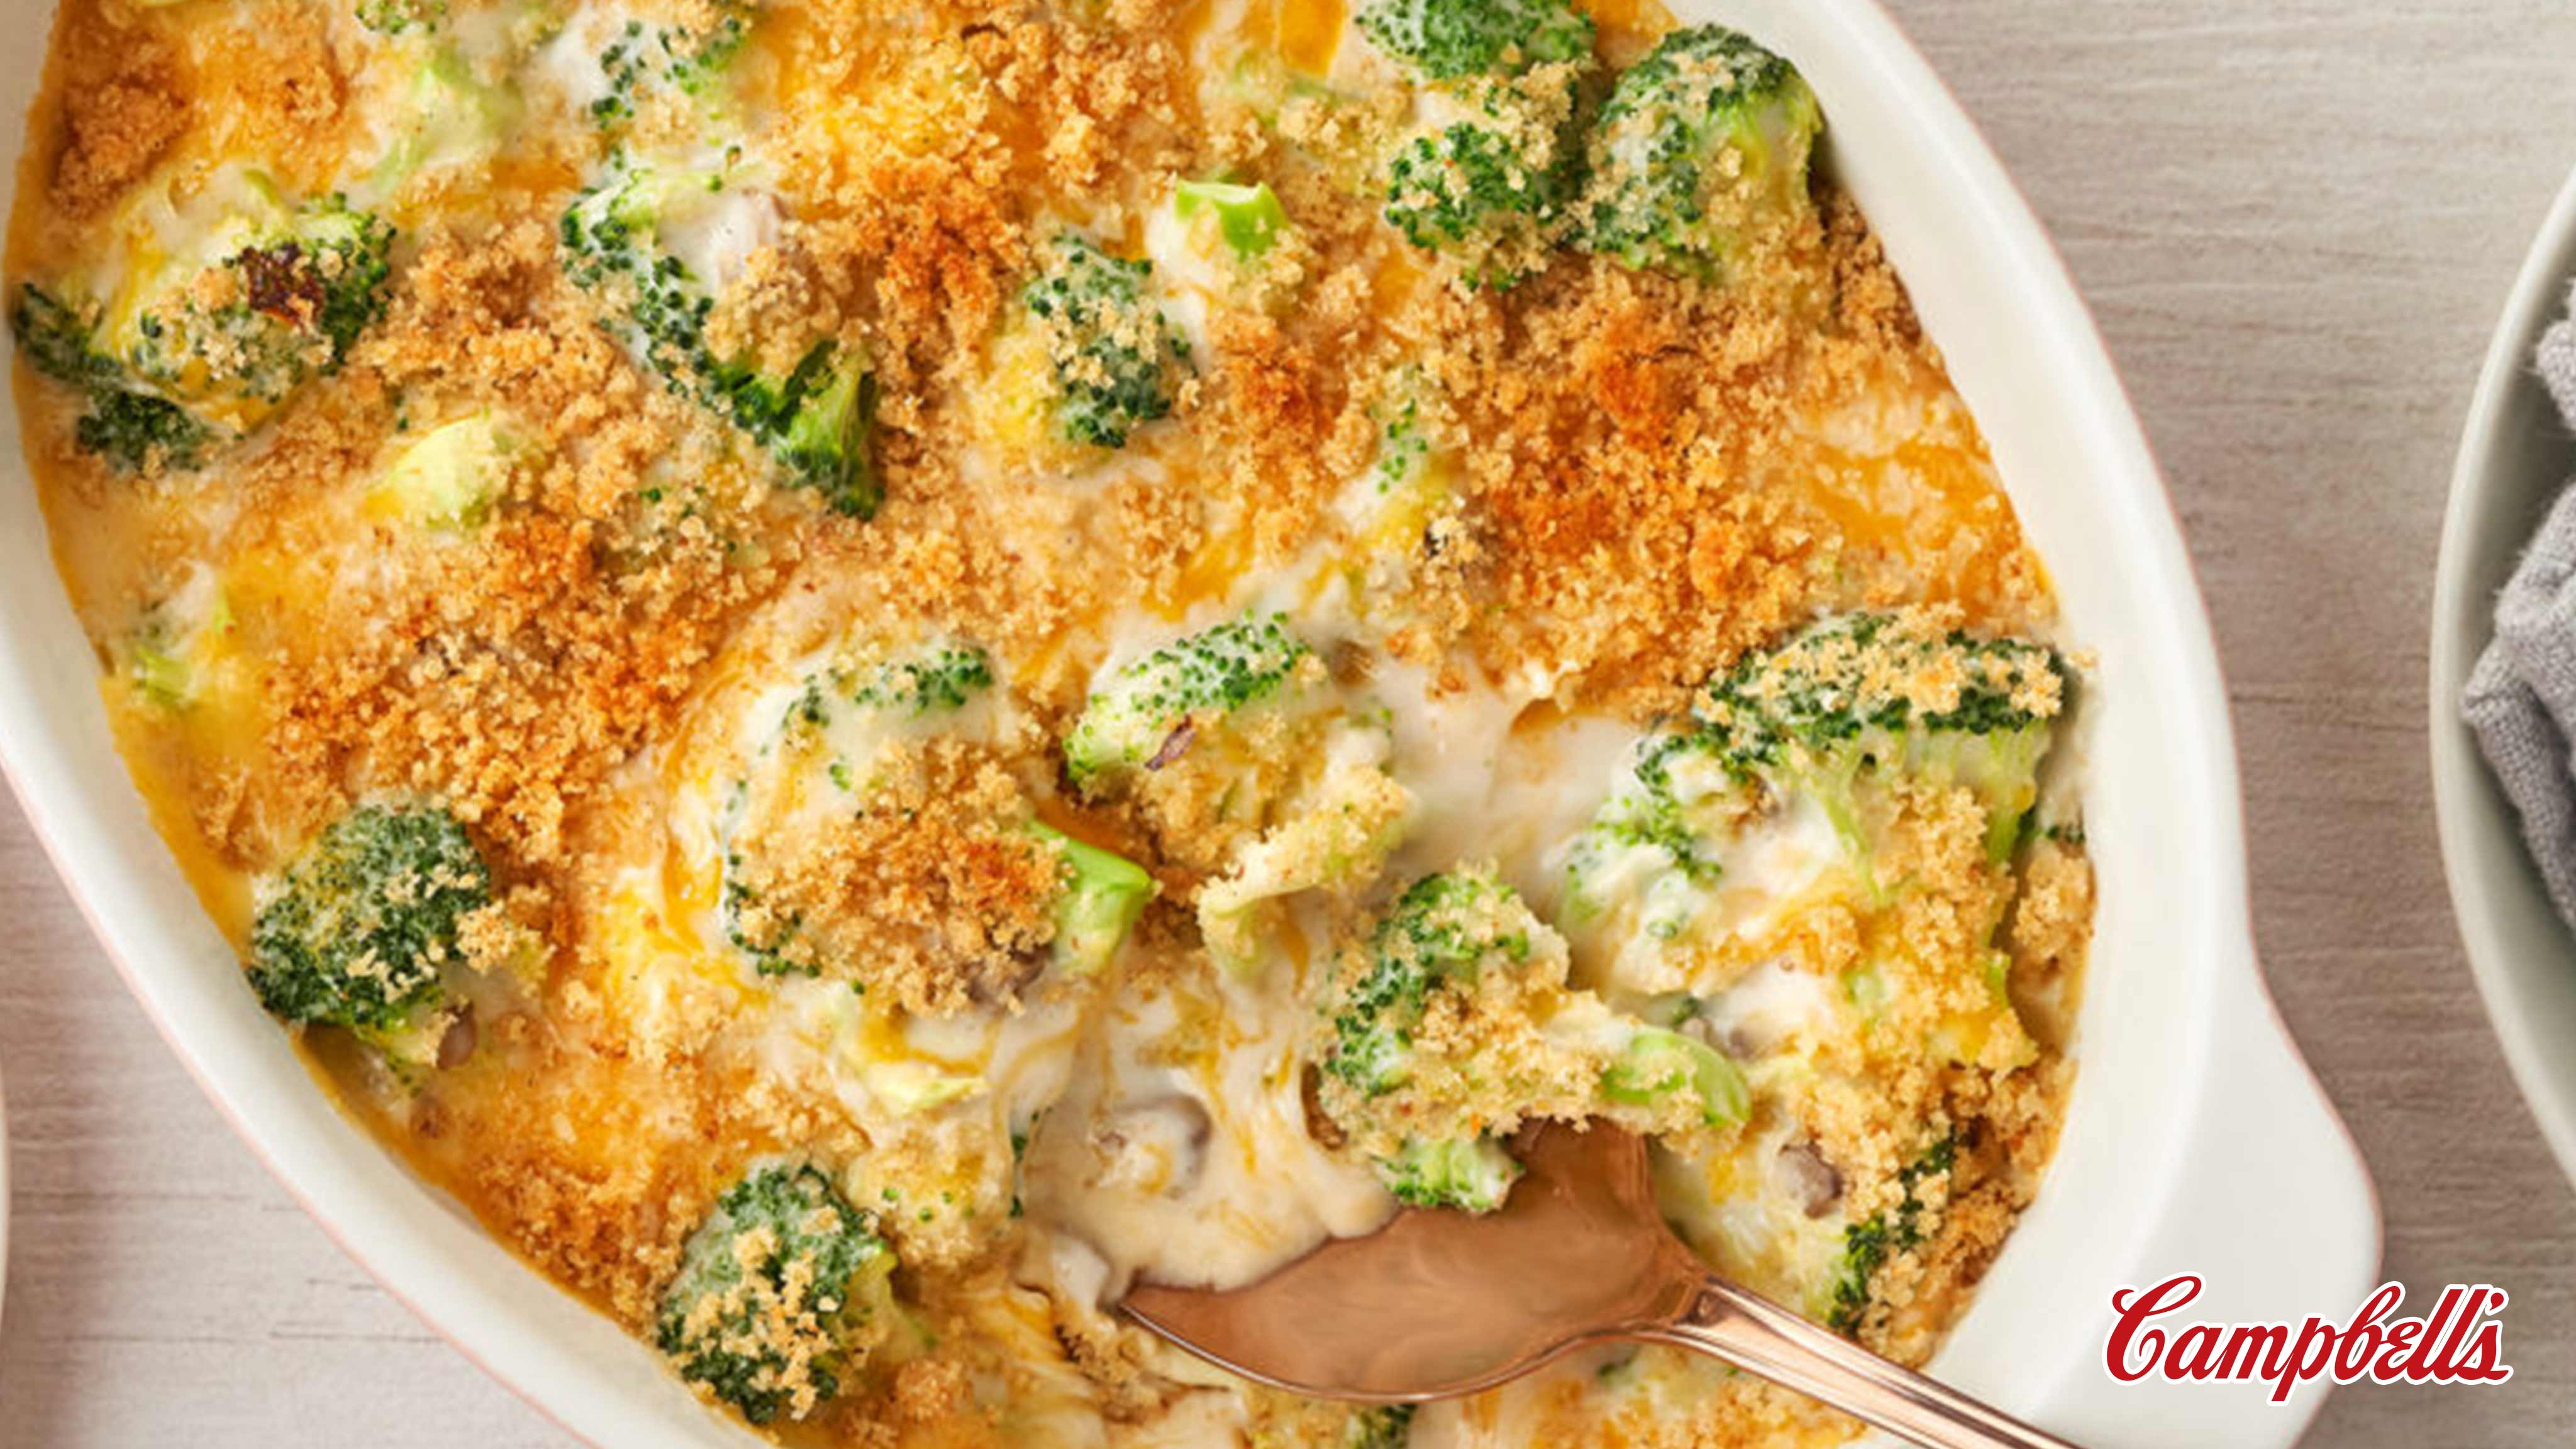 Image for Recipe Broccoli and Cheese Casserole